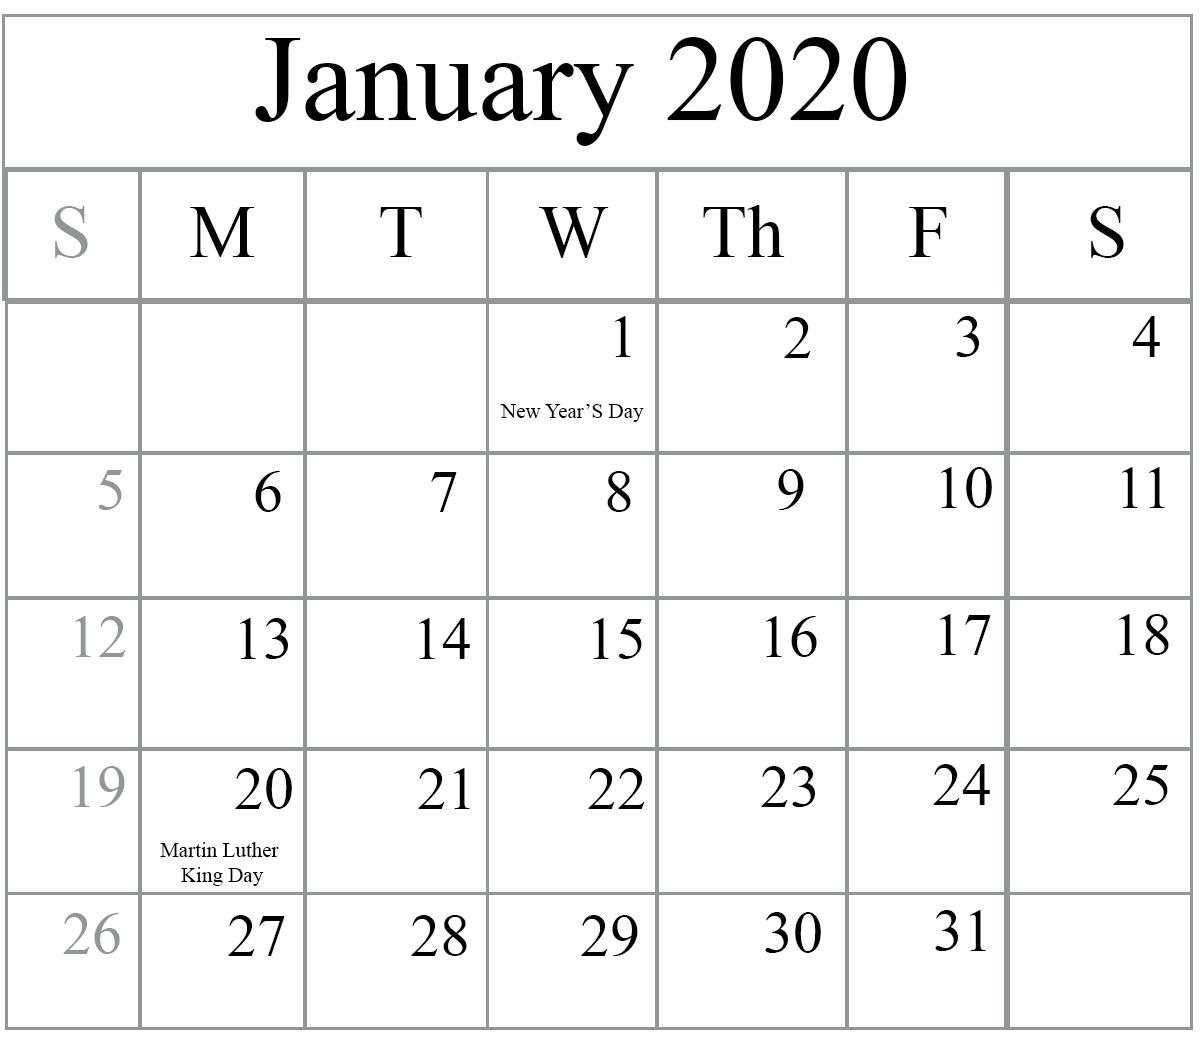 January 2020 Calendar Malaysia - Wpa.wpart.co